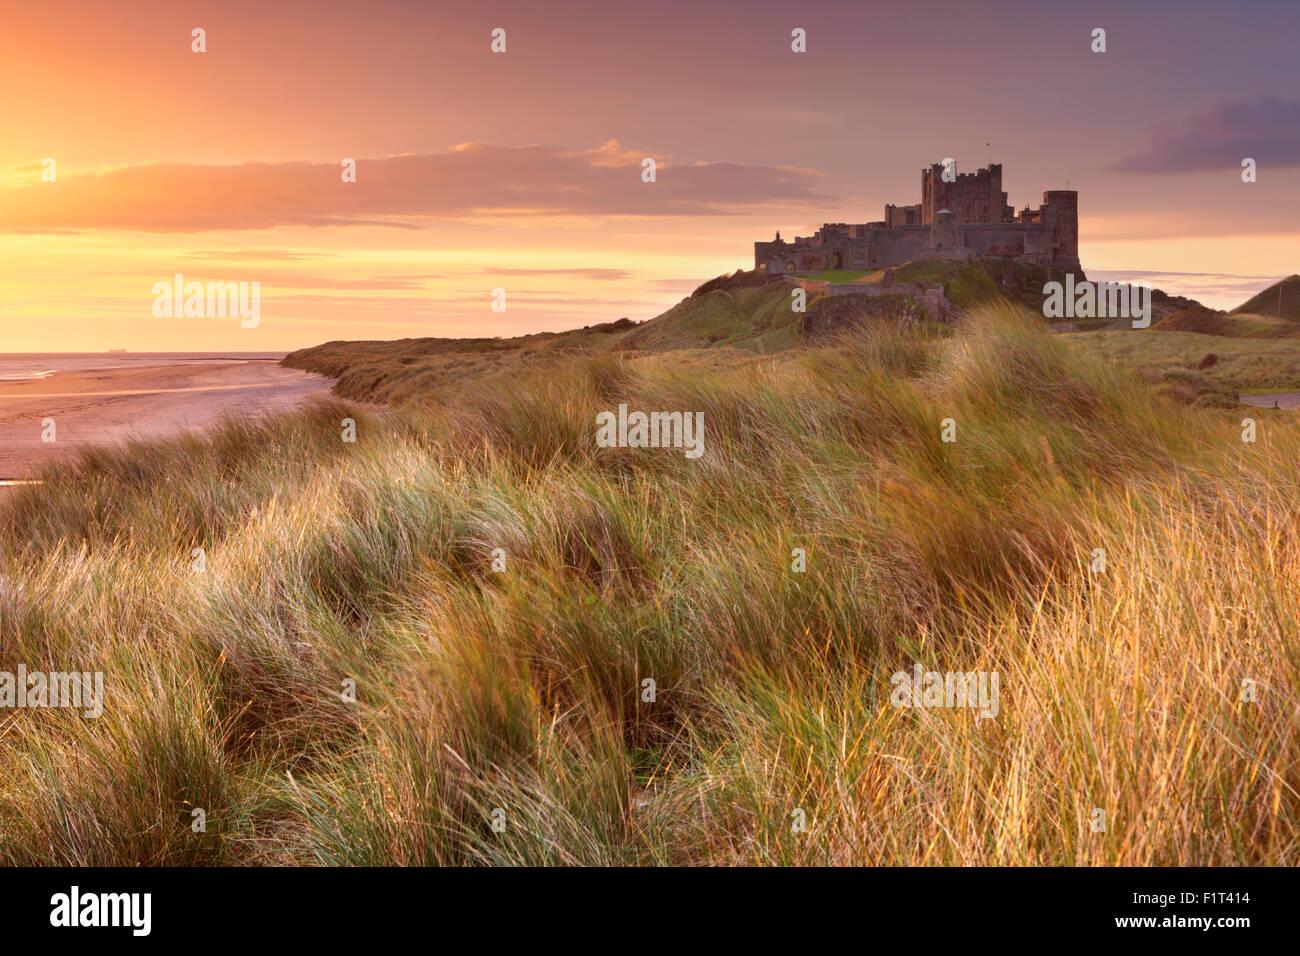 Sonnenaufgang über den Dünen bei Bamburgh Castle in Northumberland, England. Stockbild